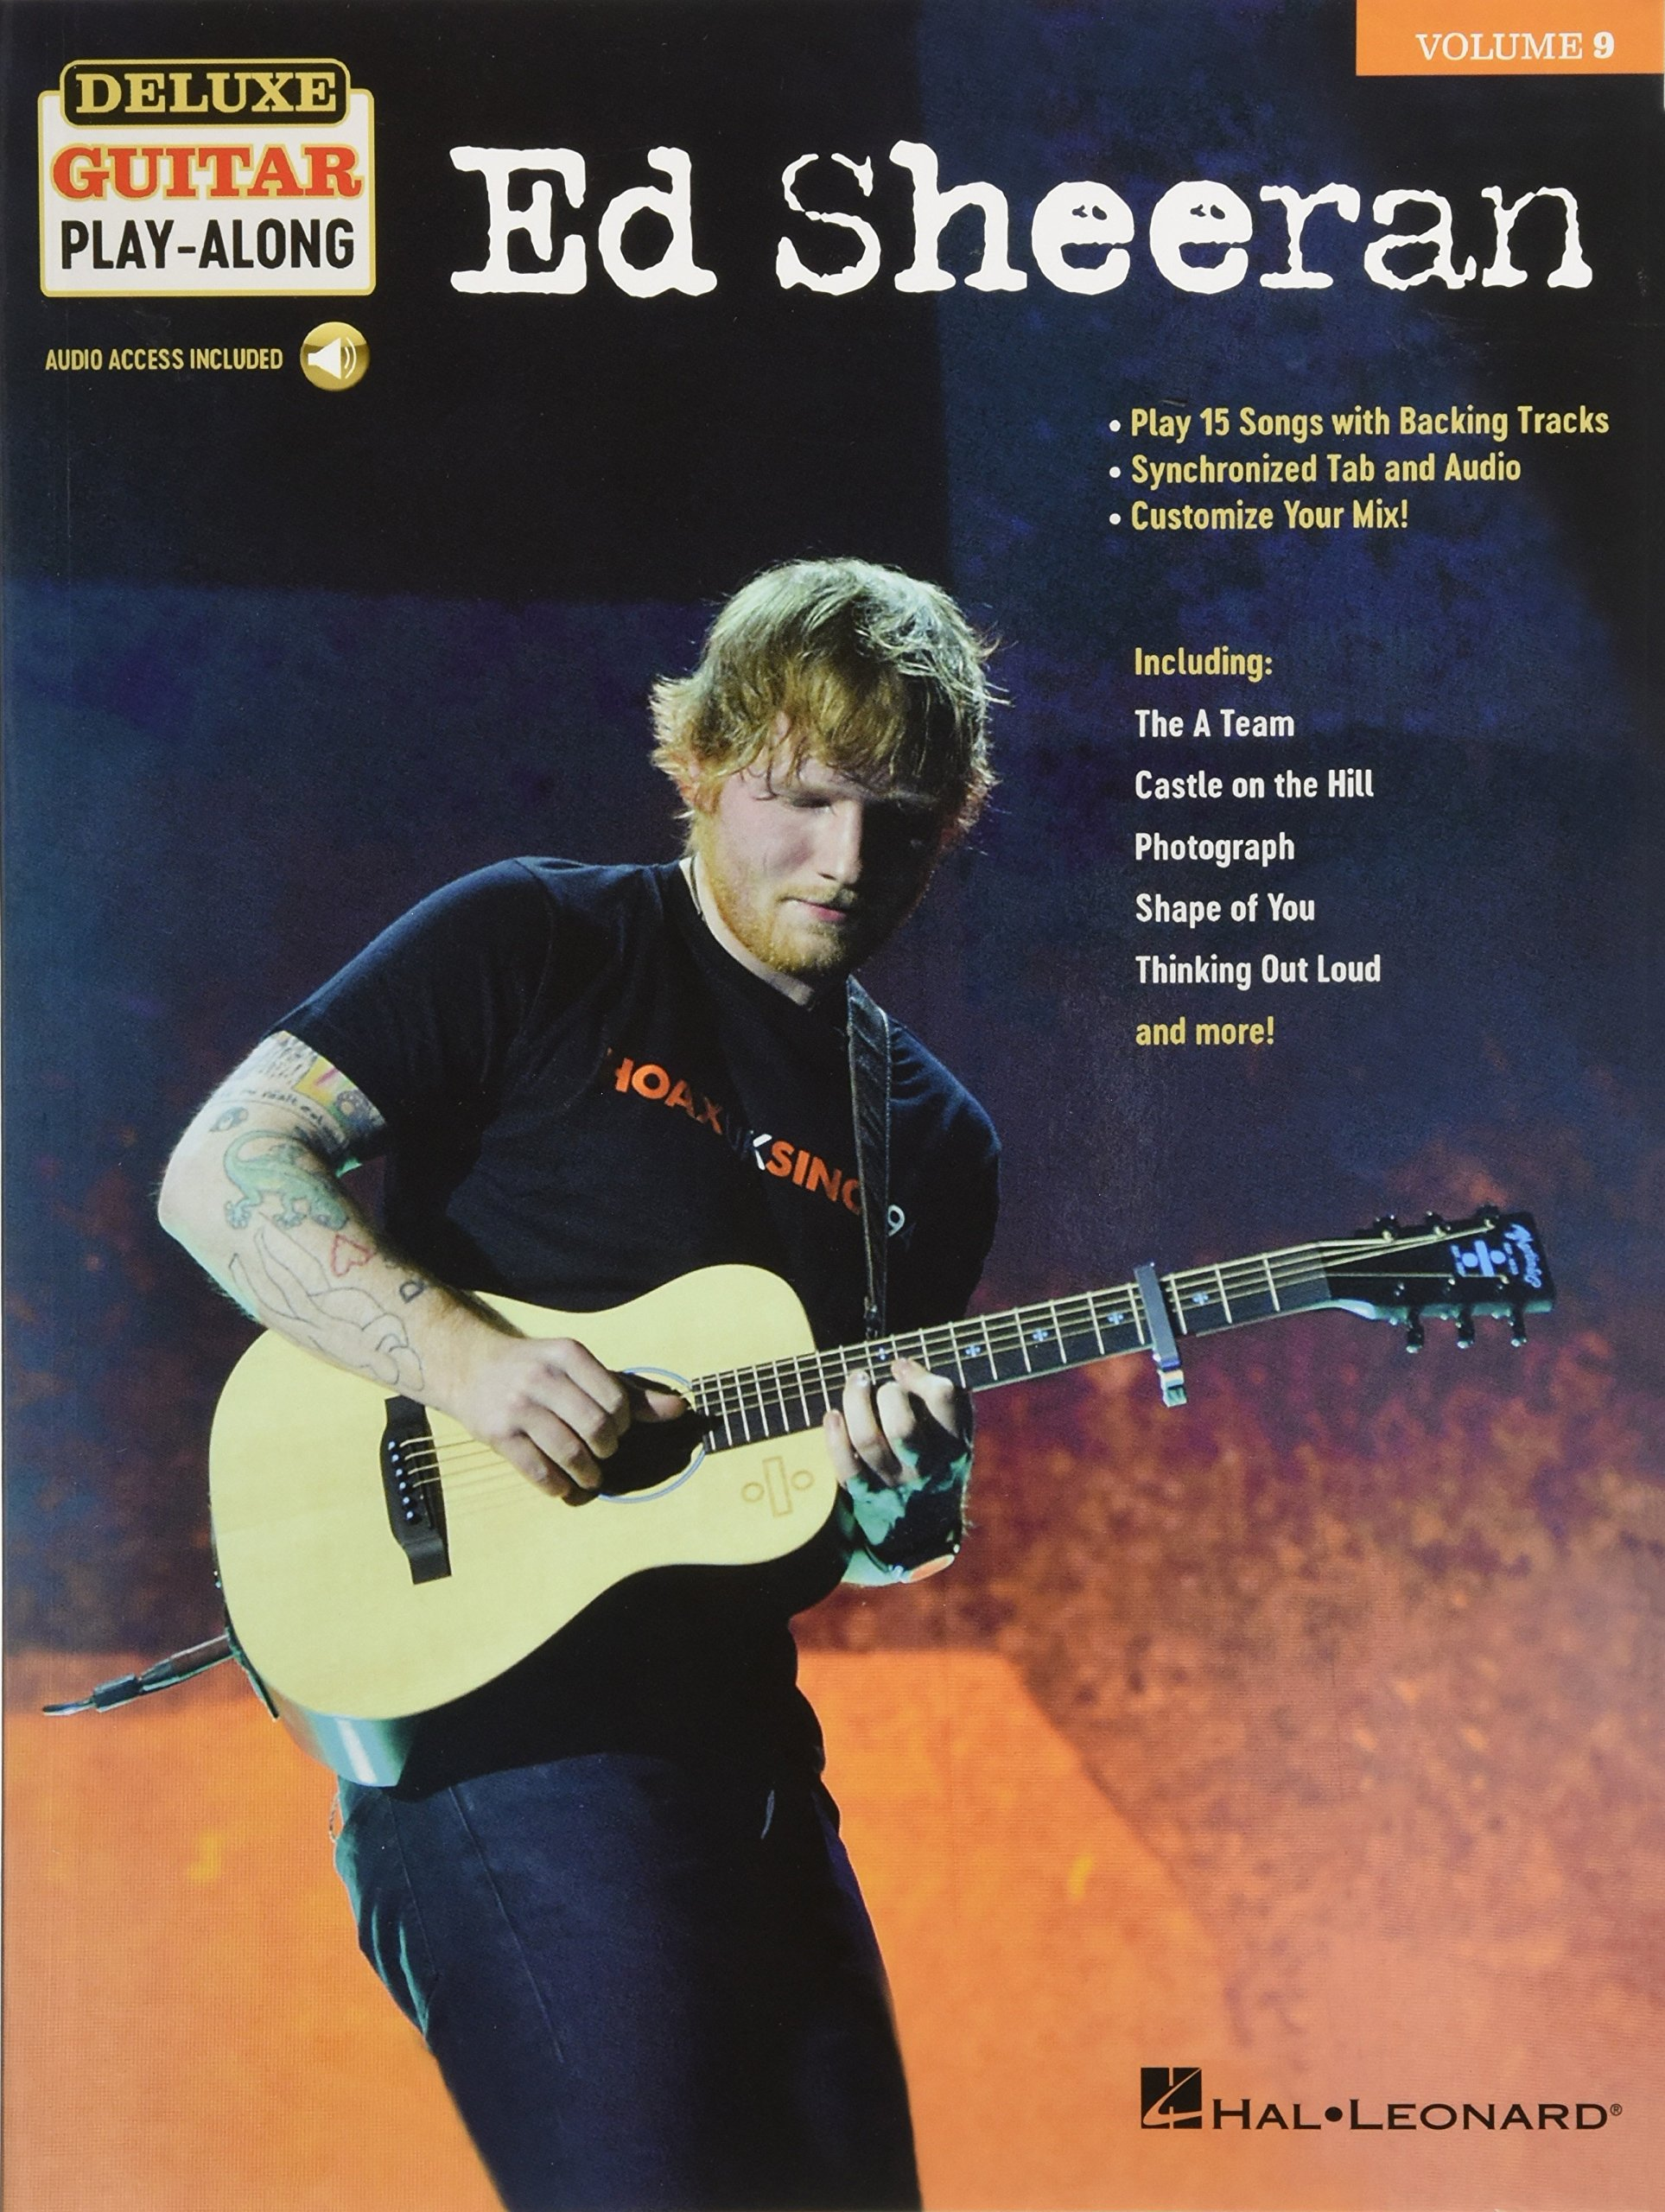 Deluxe Guitar Play-Along: Ed Sheeran: 9: Amazon.es: Sheeran, Ed ...